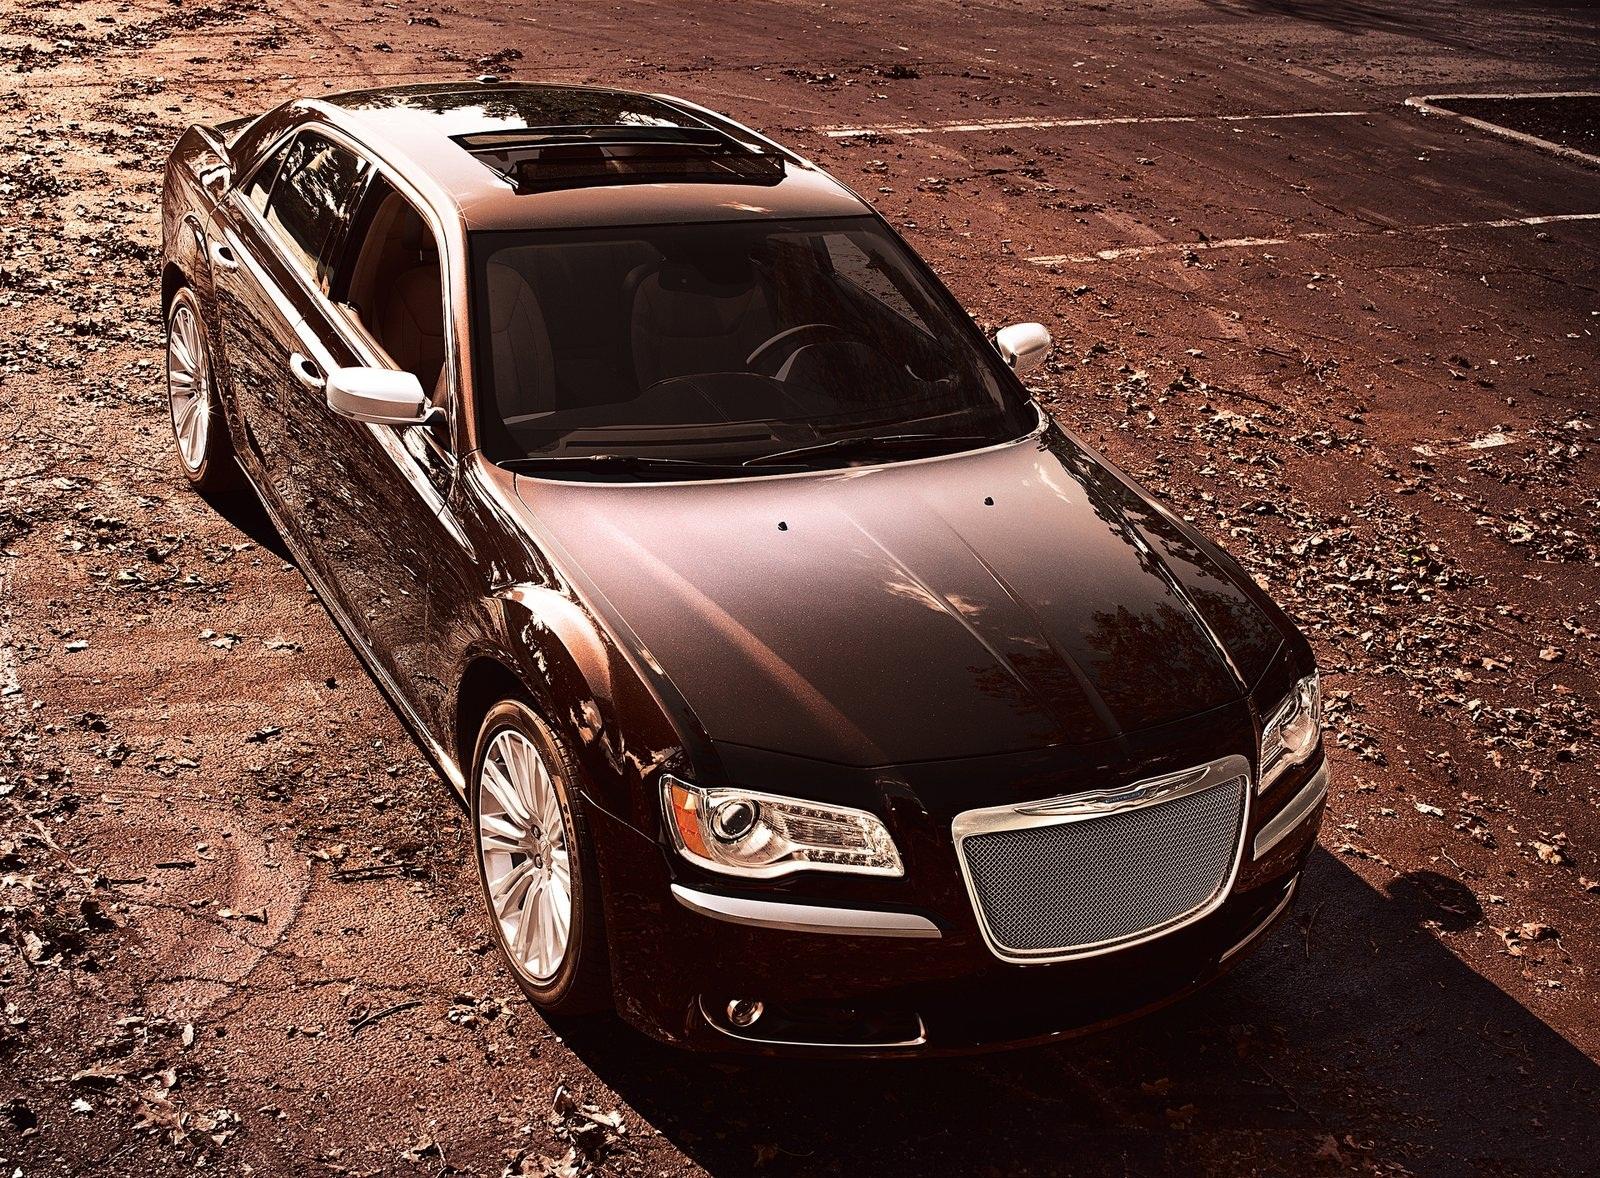 Luxury Vehicle 300: 2012 Chrysler 300 Luxury Series